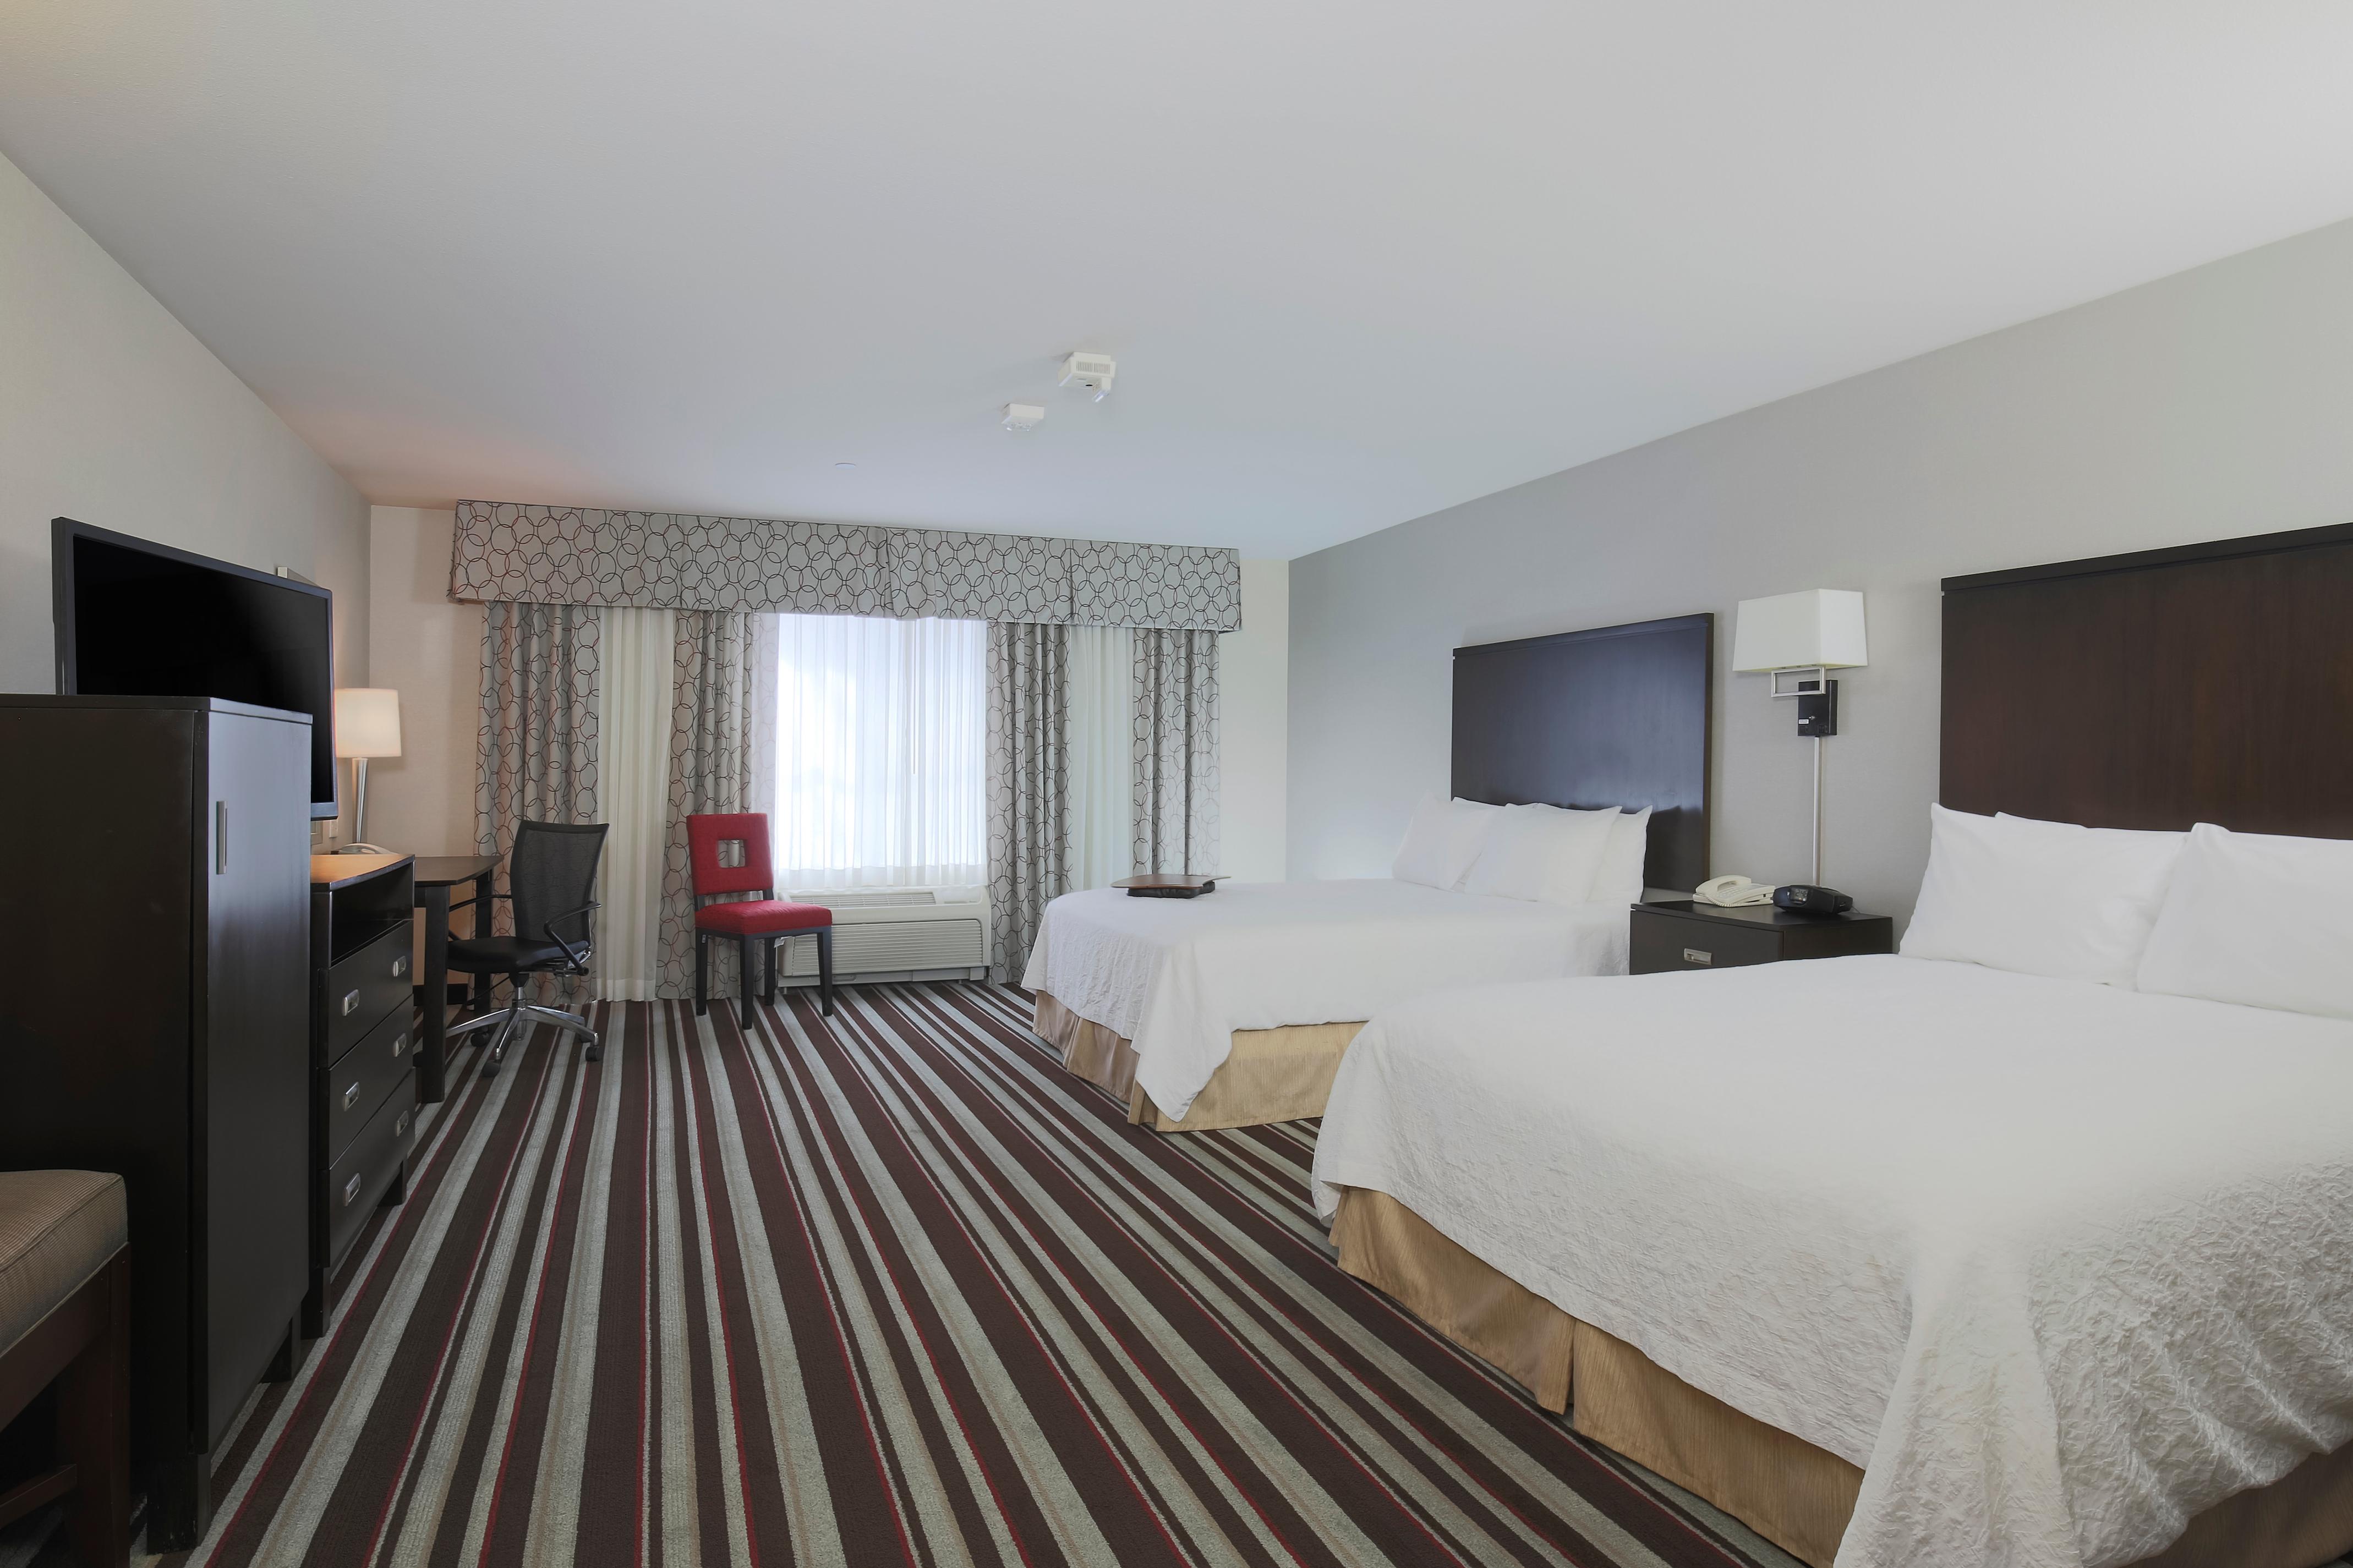 Hampton Inn Amp Suites San Diego Poway In Poway Ca 92064 Chamberofcommerce Com